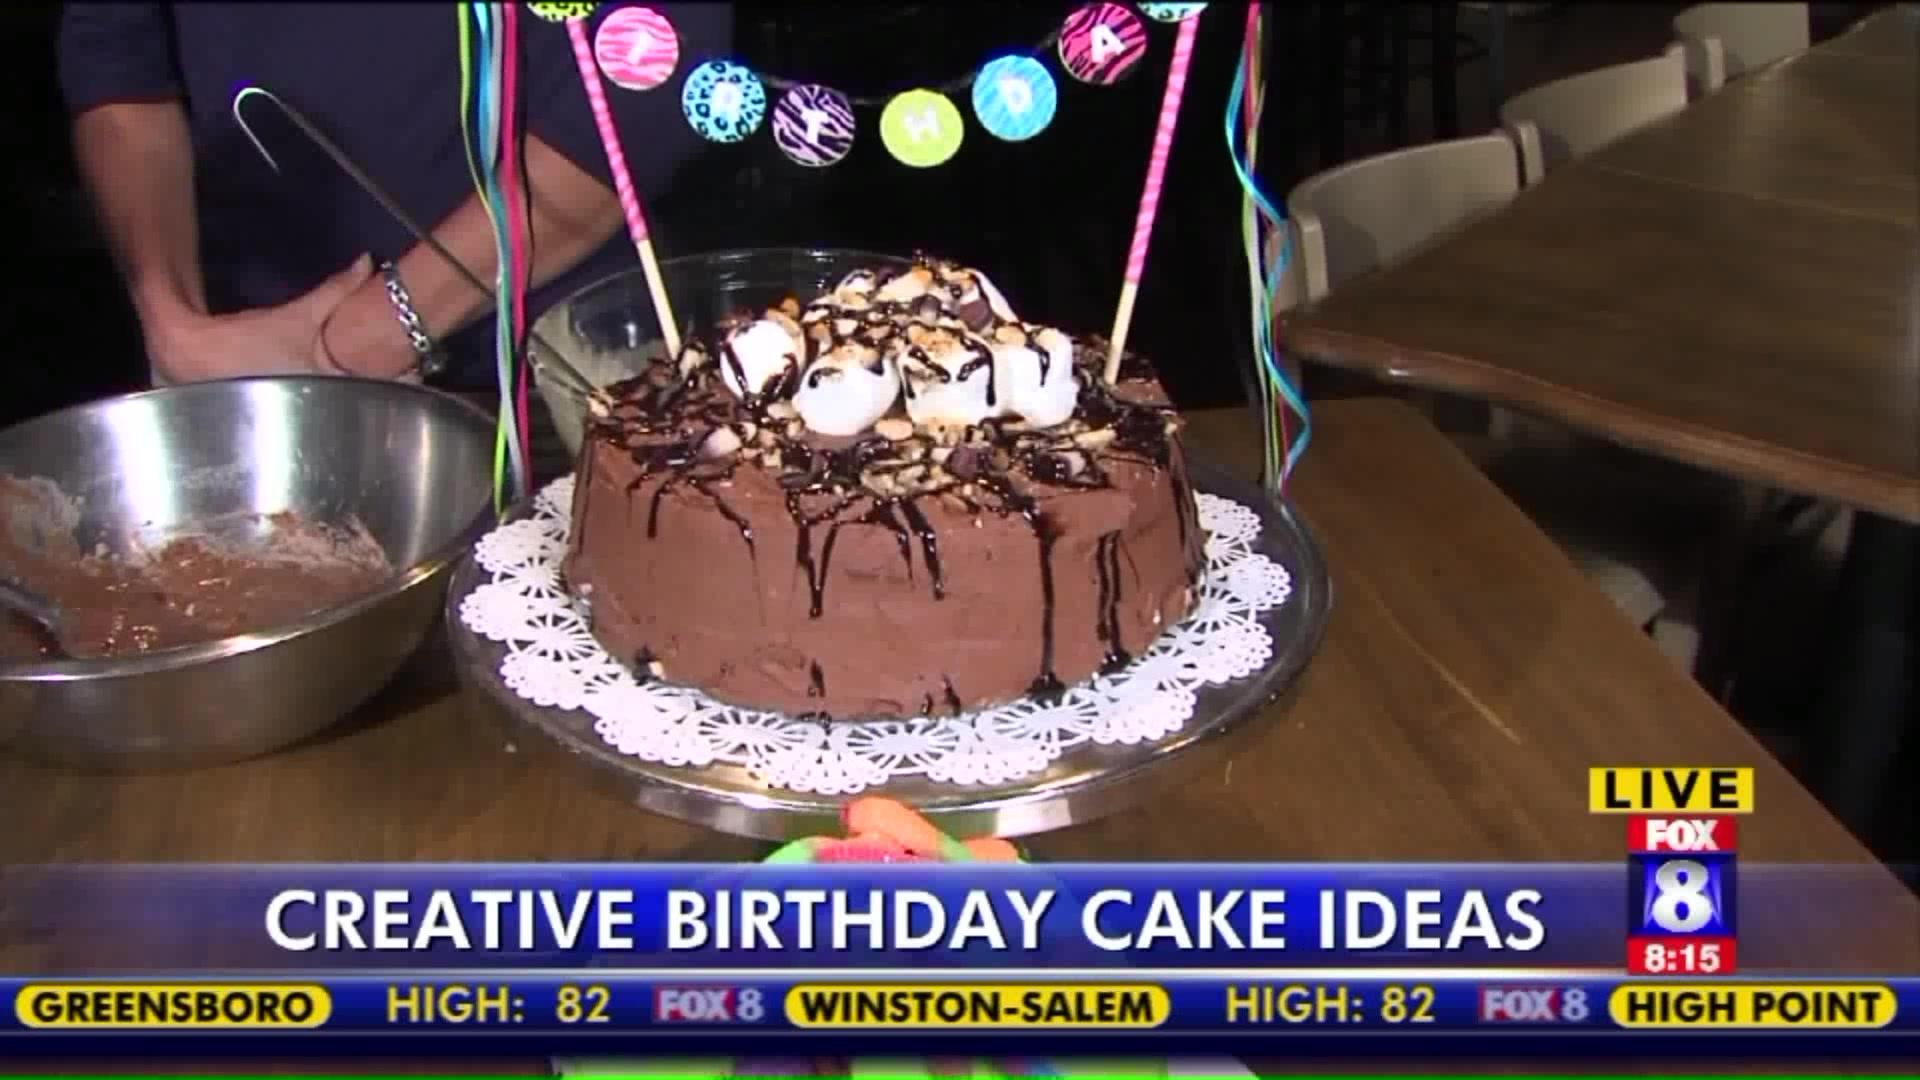 How to Make a S'Mores Cake